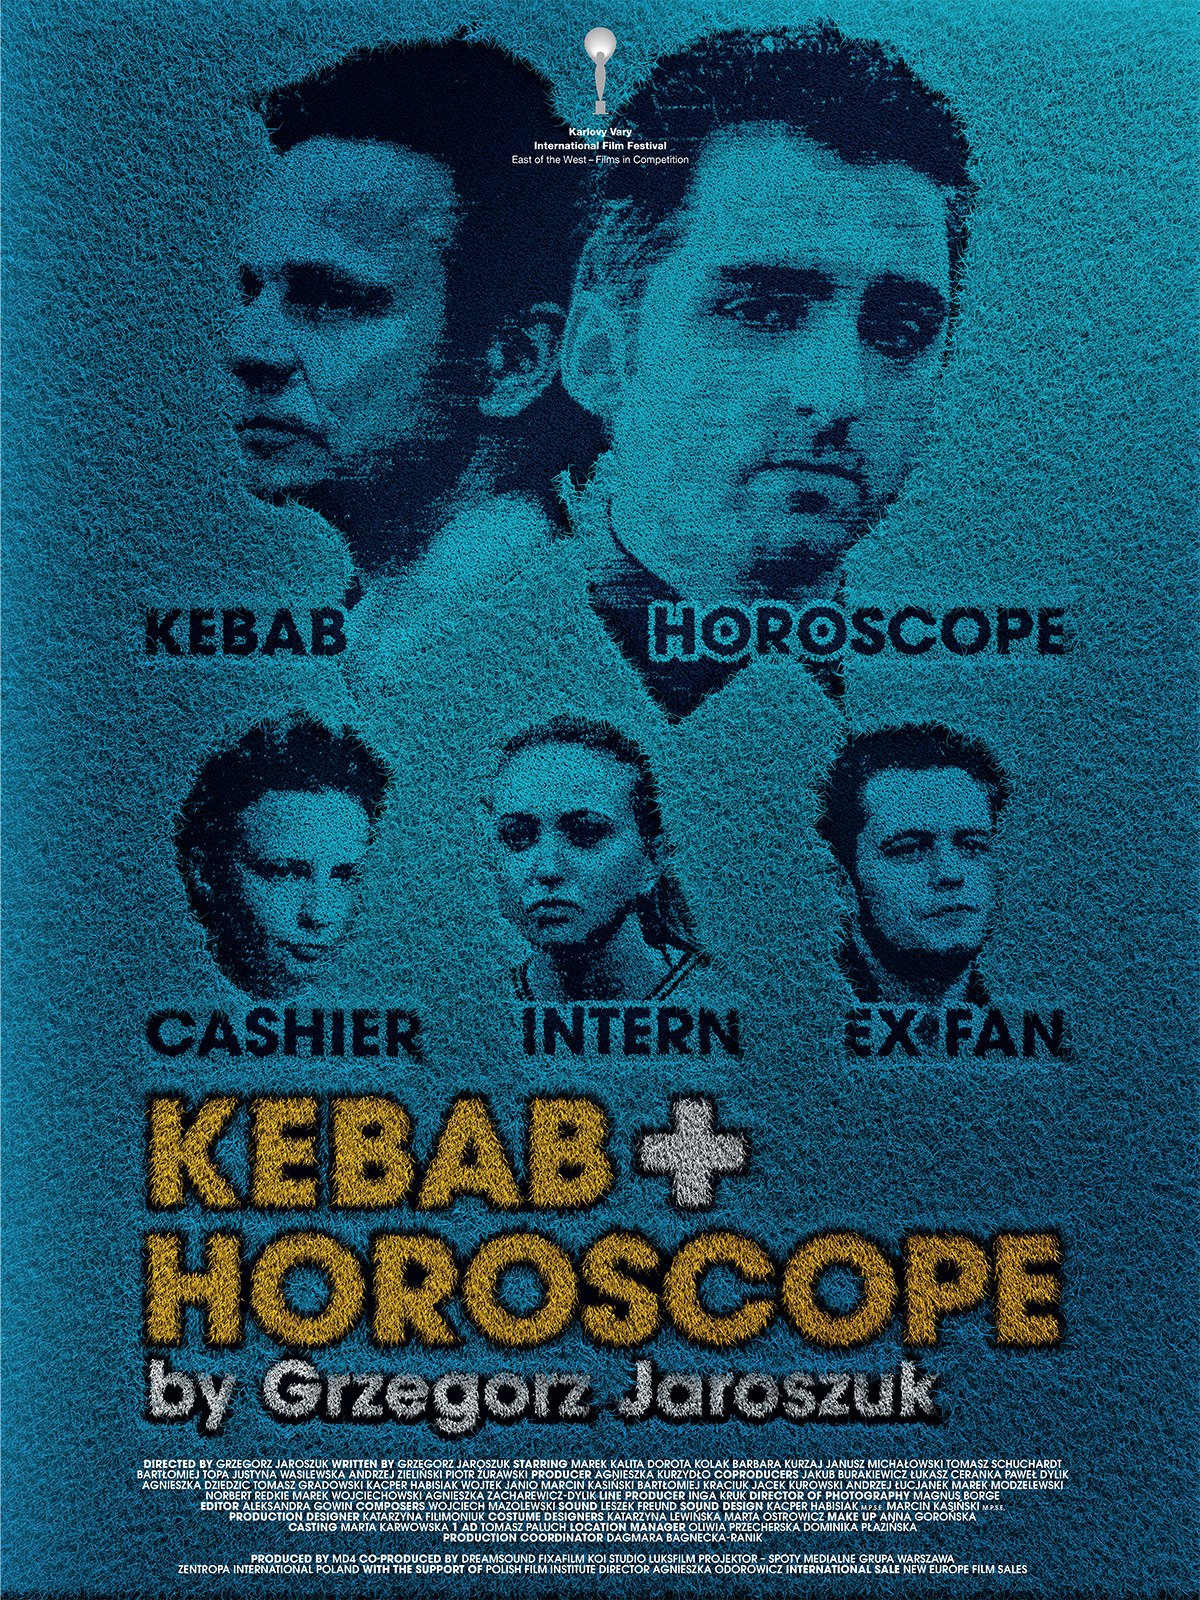 Kebab & Horoscope